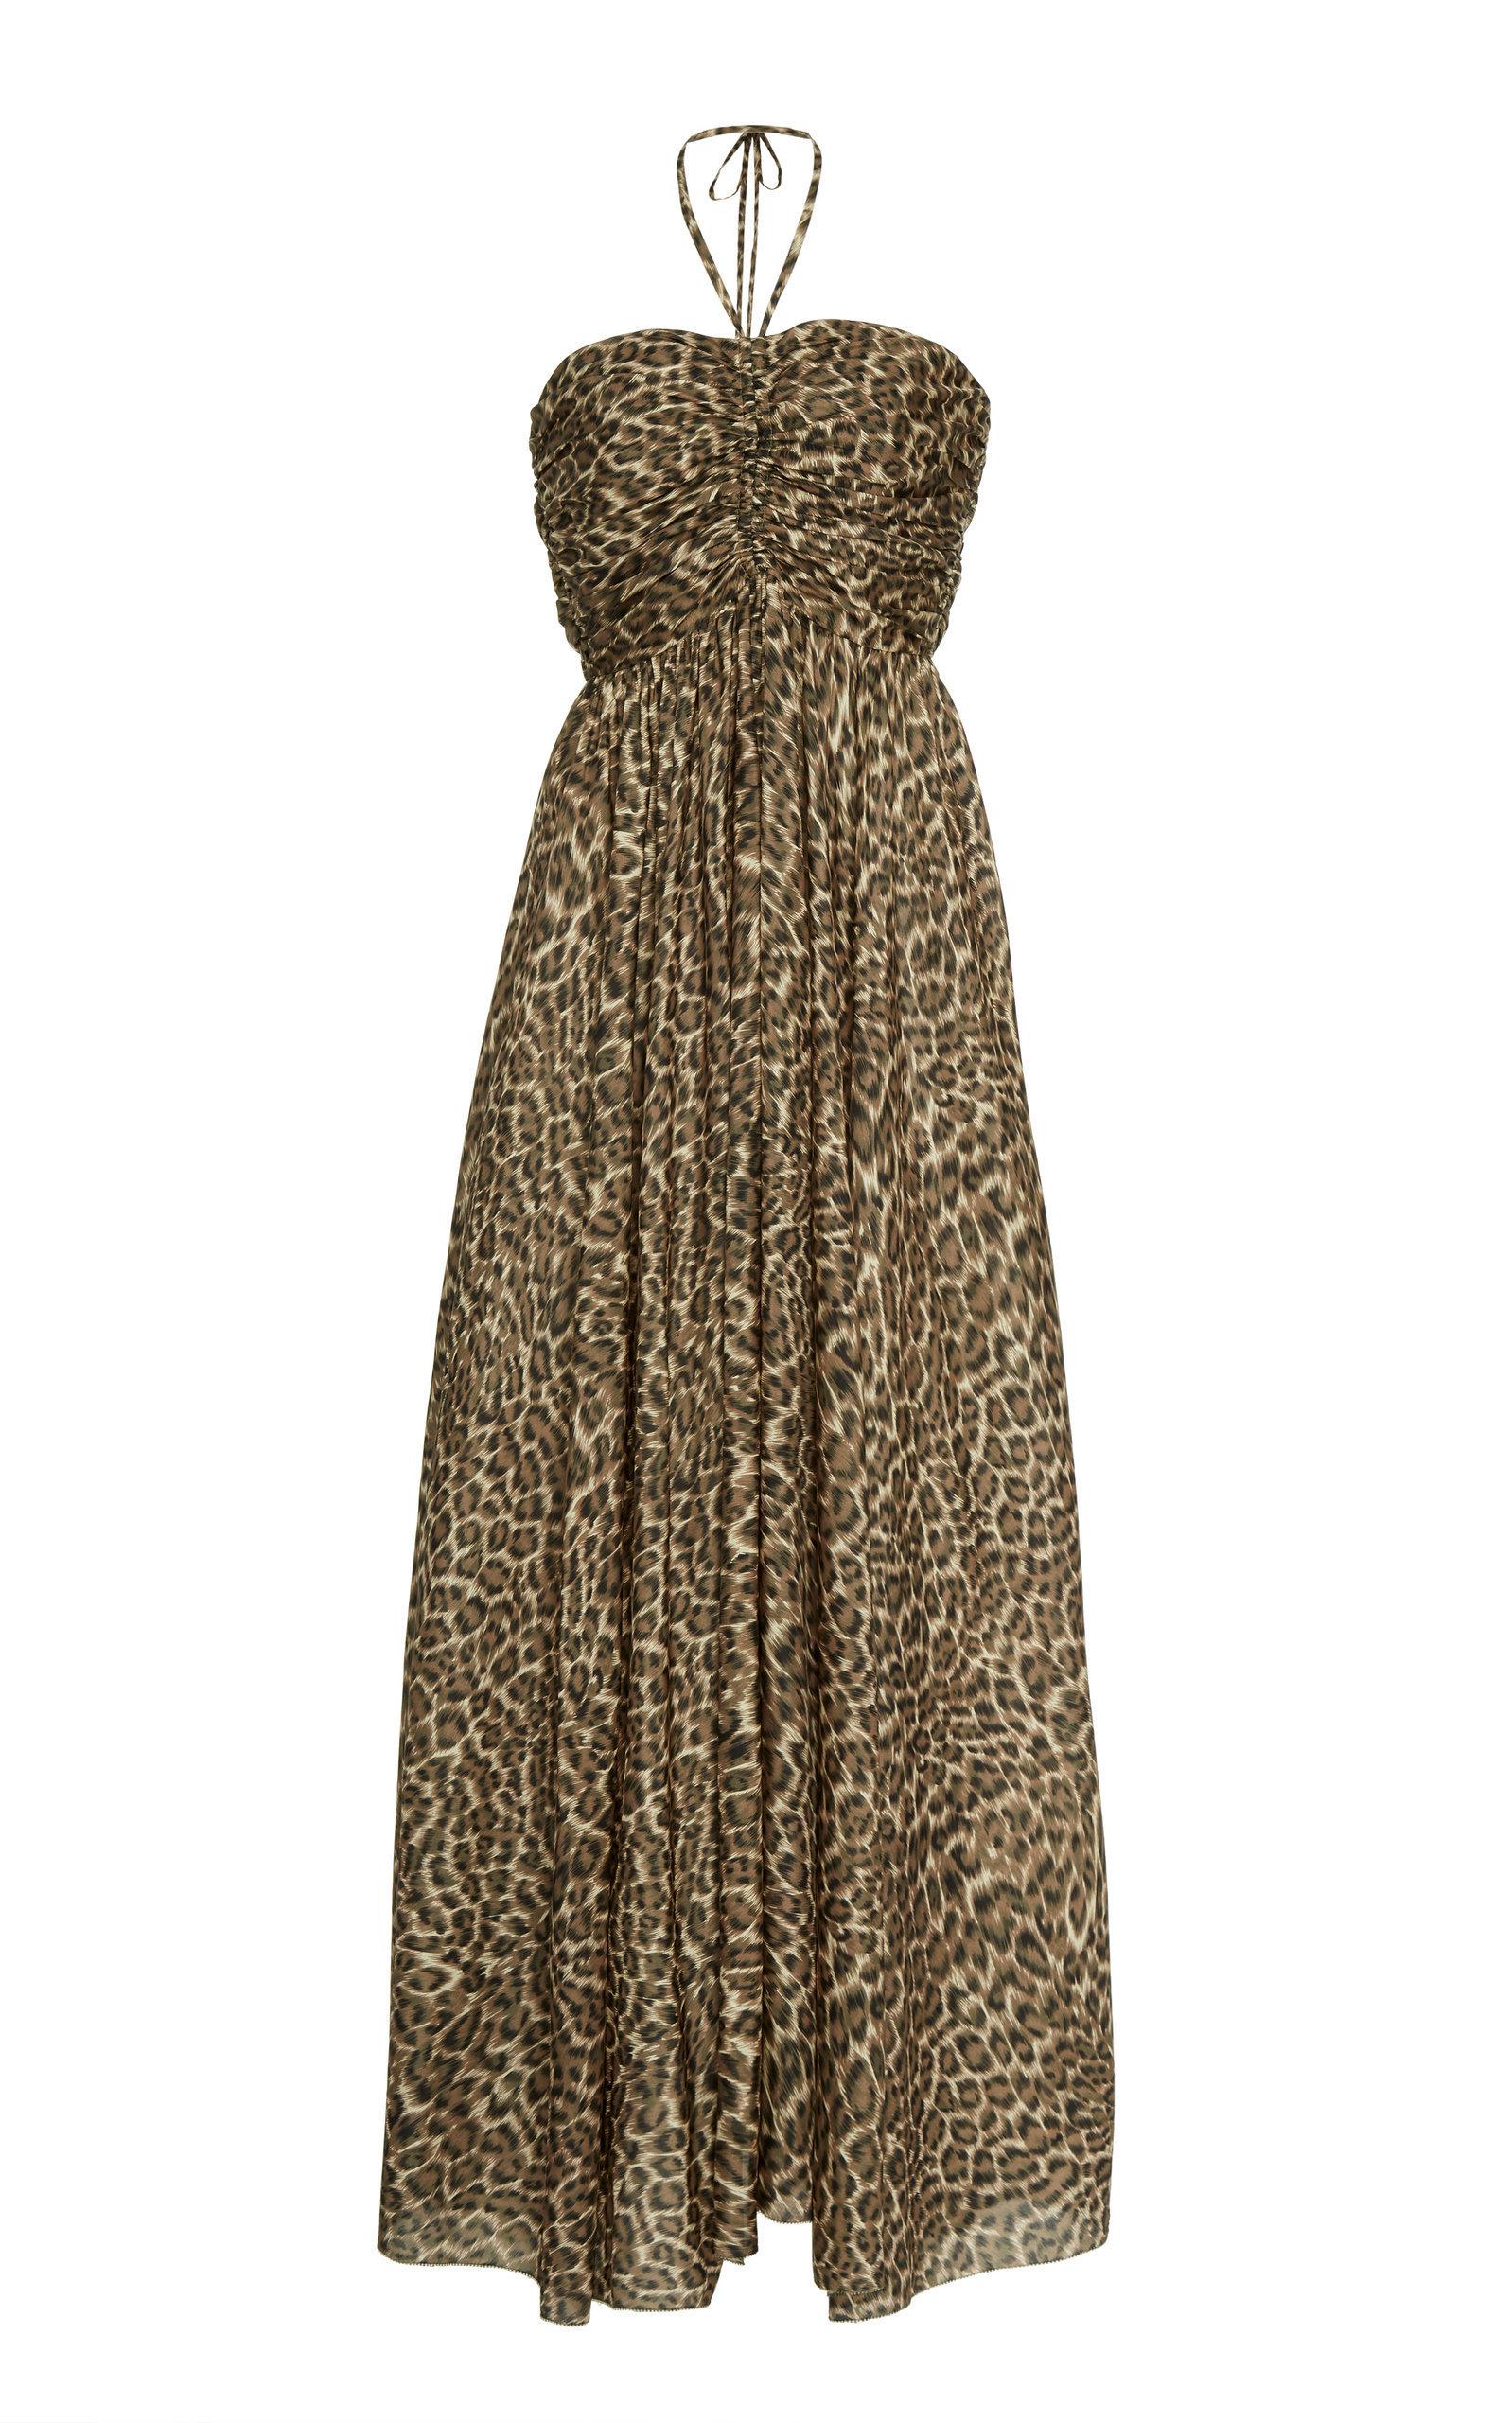 3ed7ecb0310f5b Zimmermann Suraya Ruche Silk Leopard Dress In Animal   ModeSens